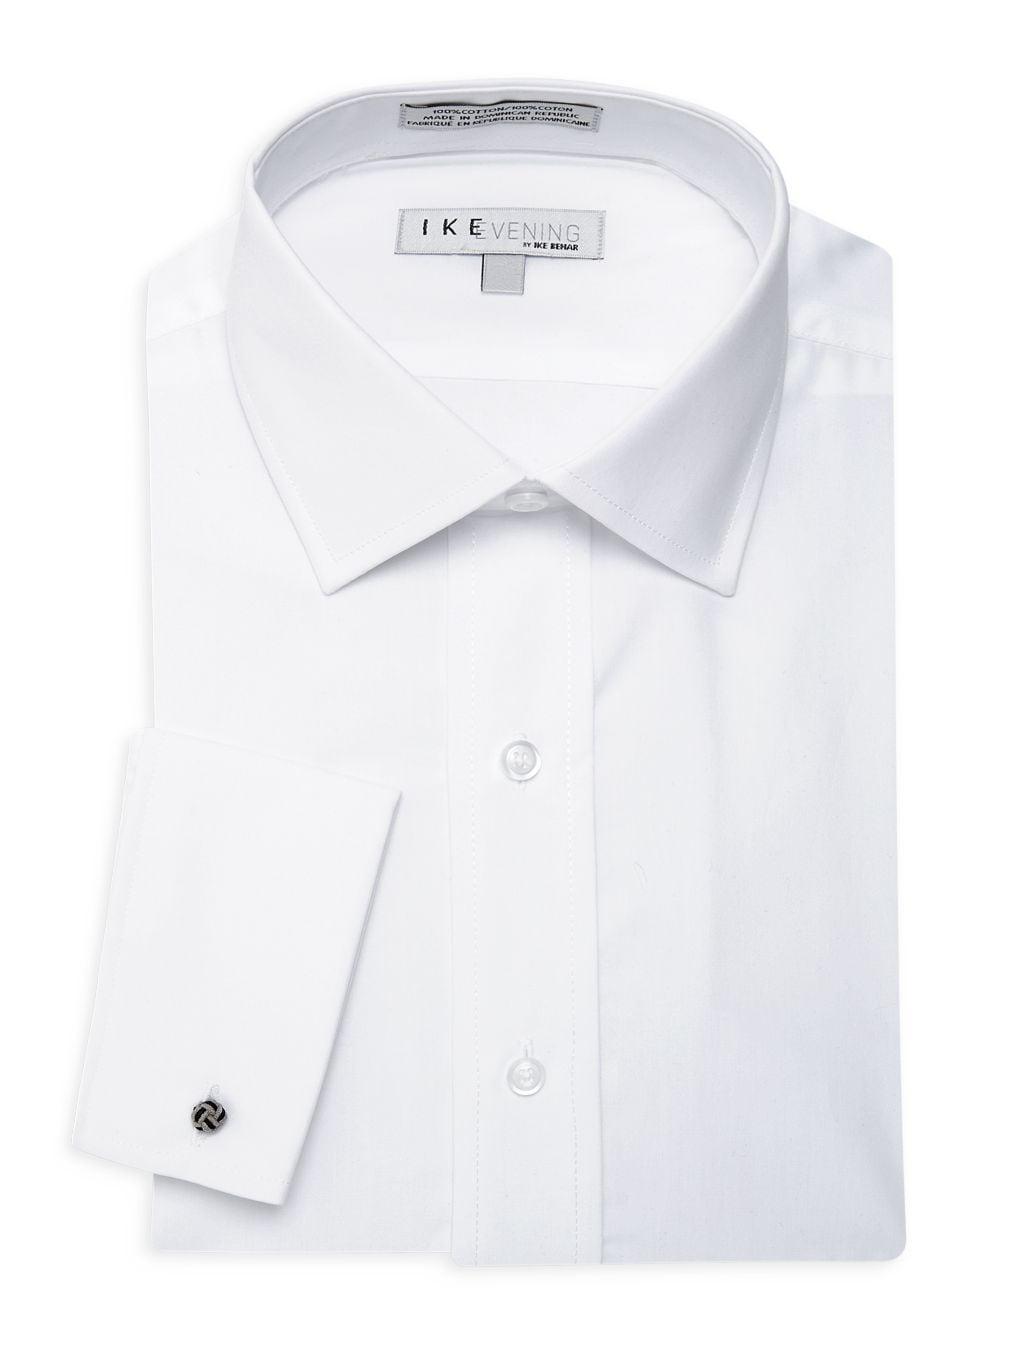 Ike Evening by Ike Behar Long-Sleeve Dress Shirt